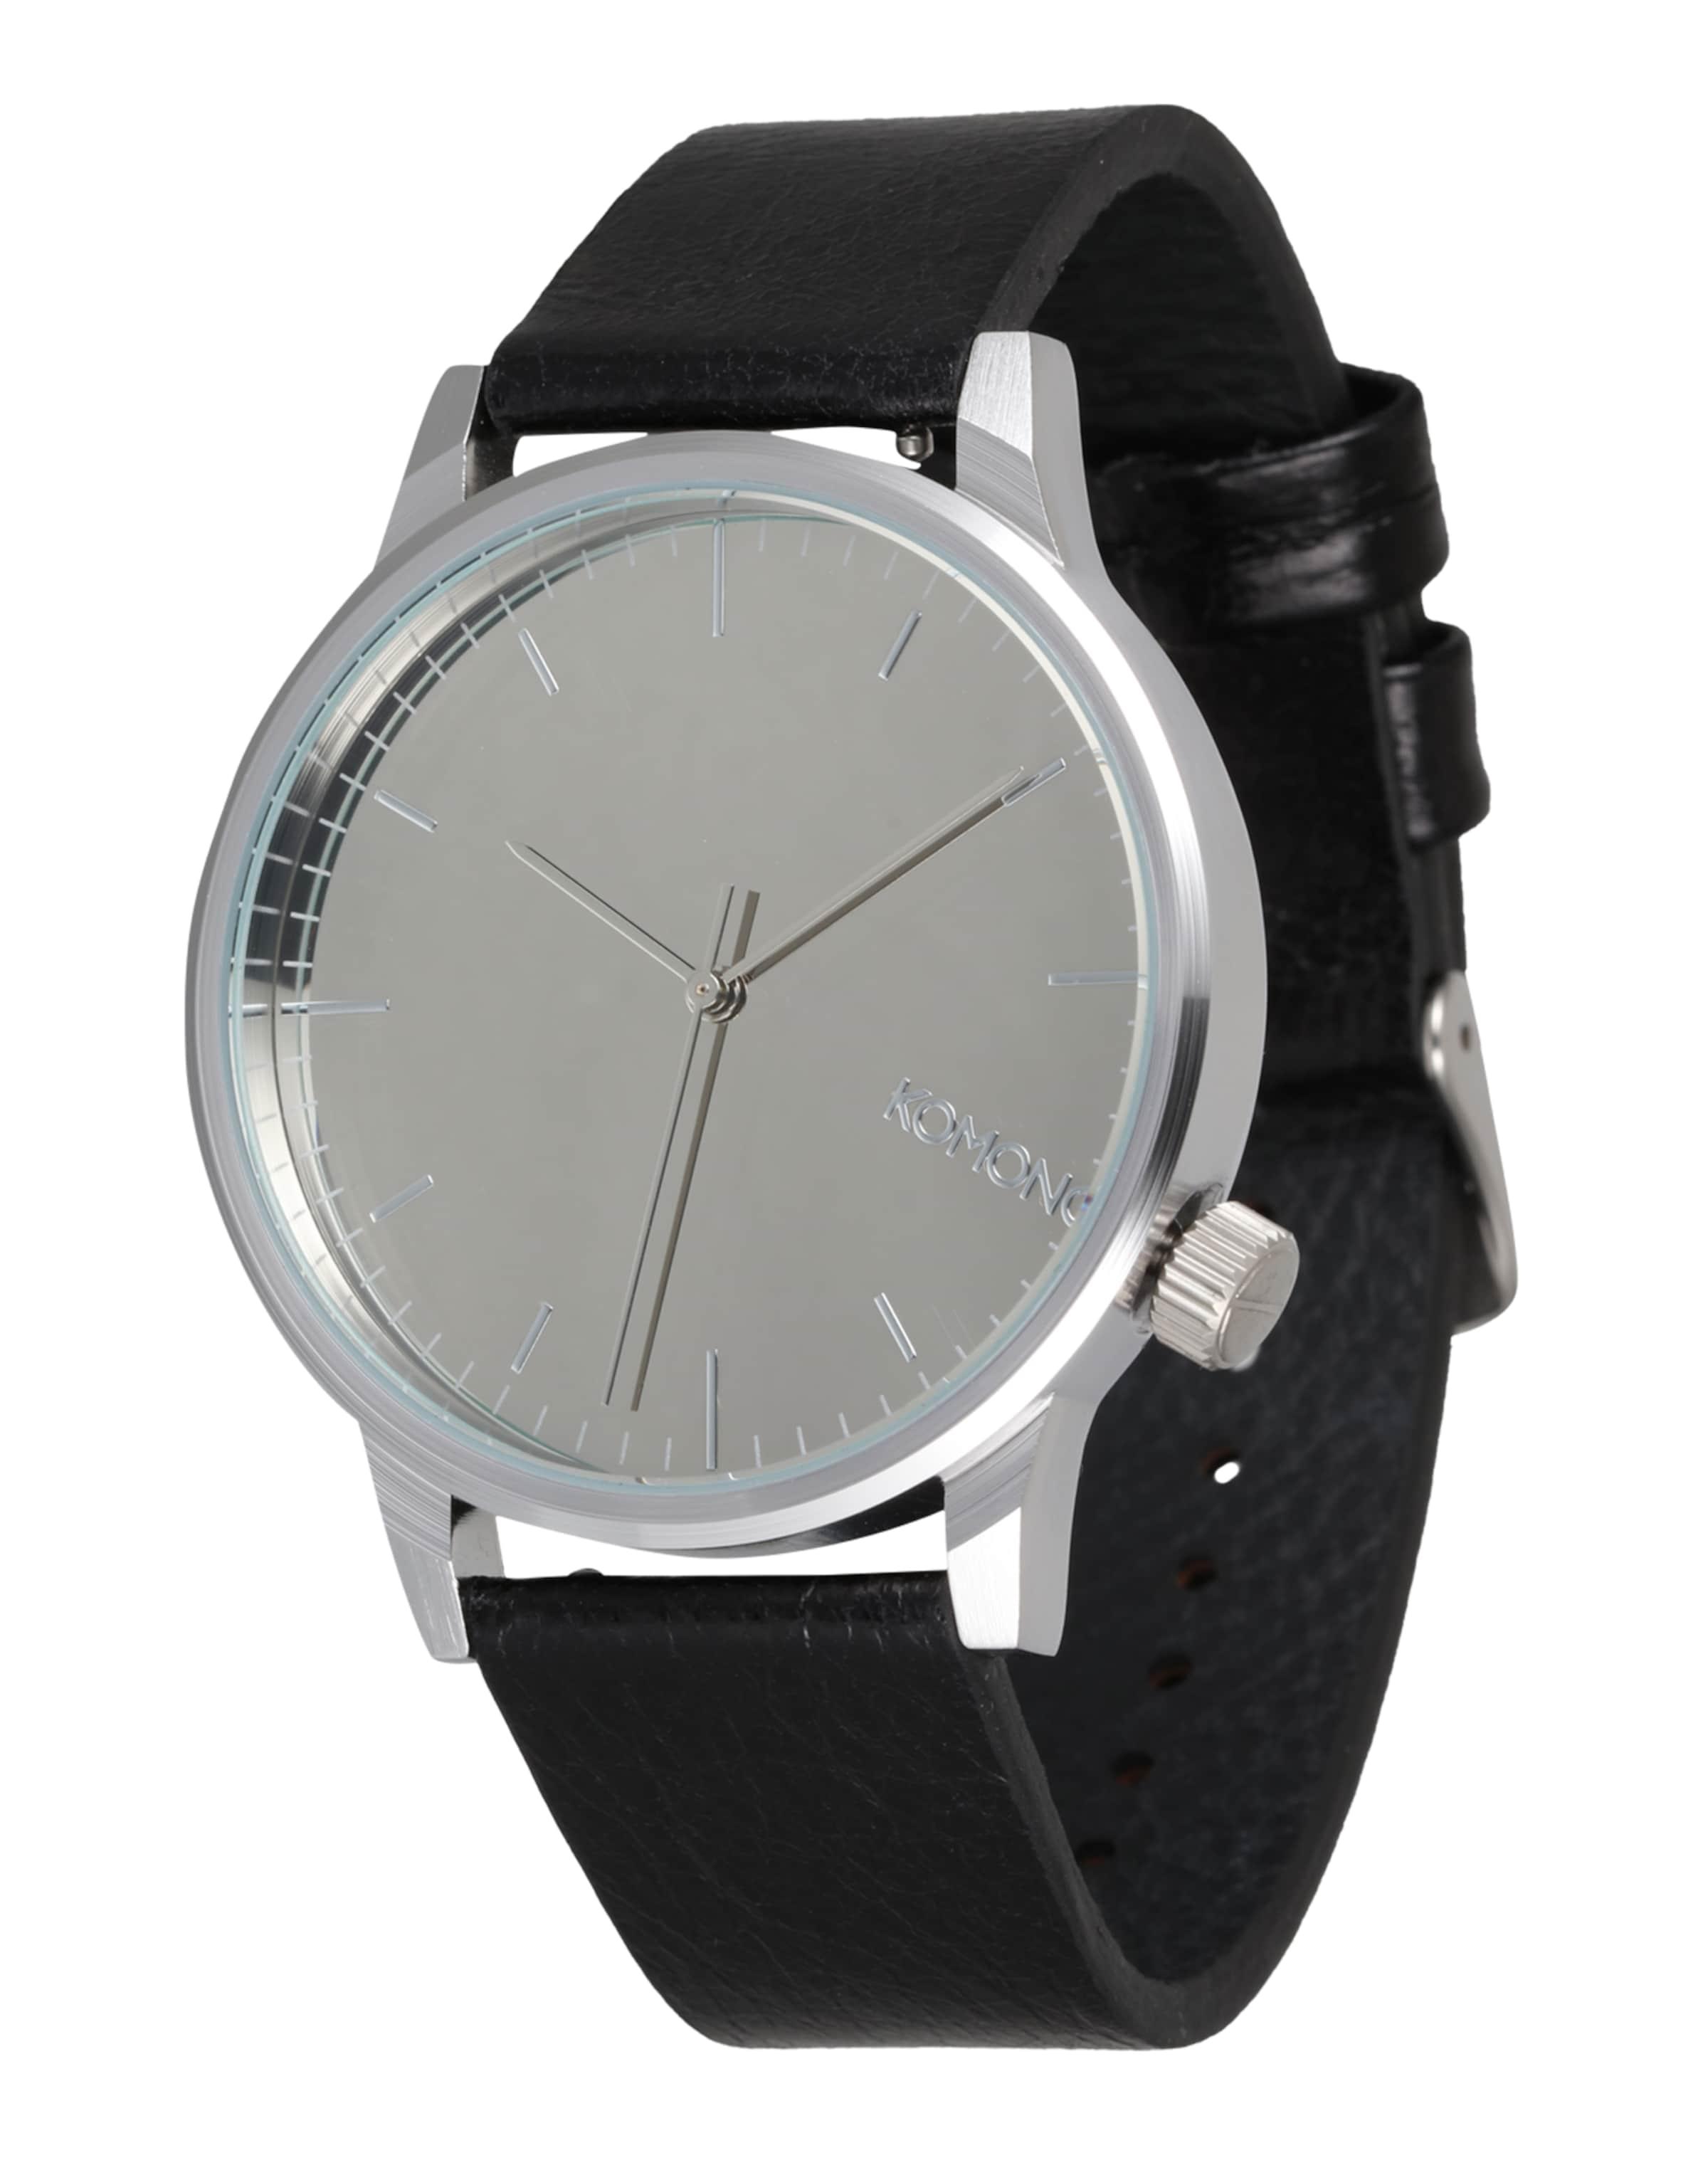 Auslass Niedriger Preis Verkauf 100% Authentisch Komono Armbanduhr 'WINSTON MIRROR' NgDcYF2